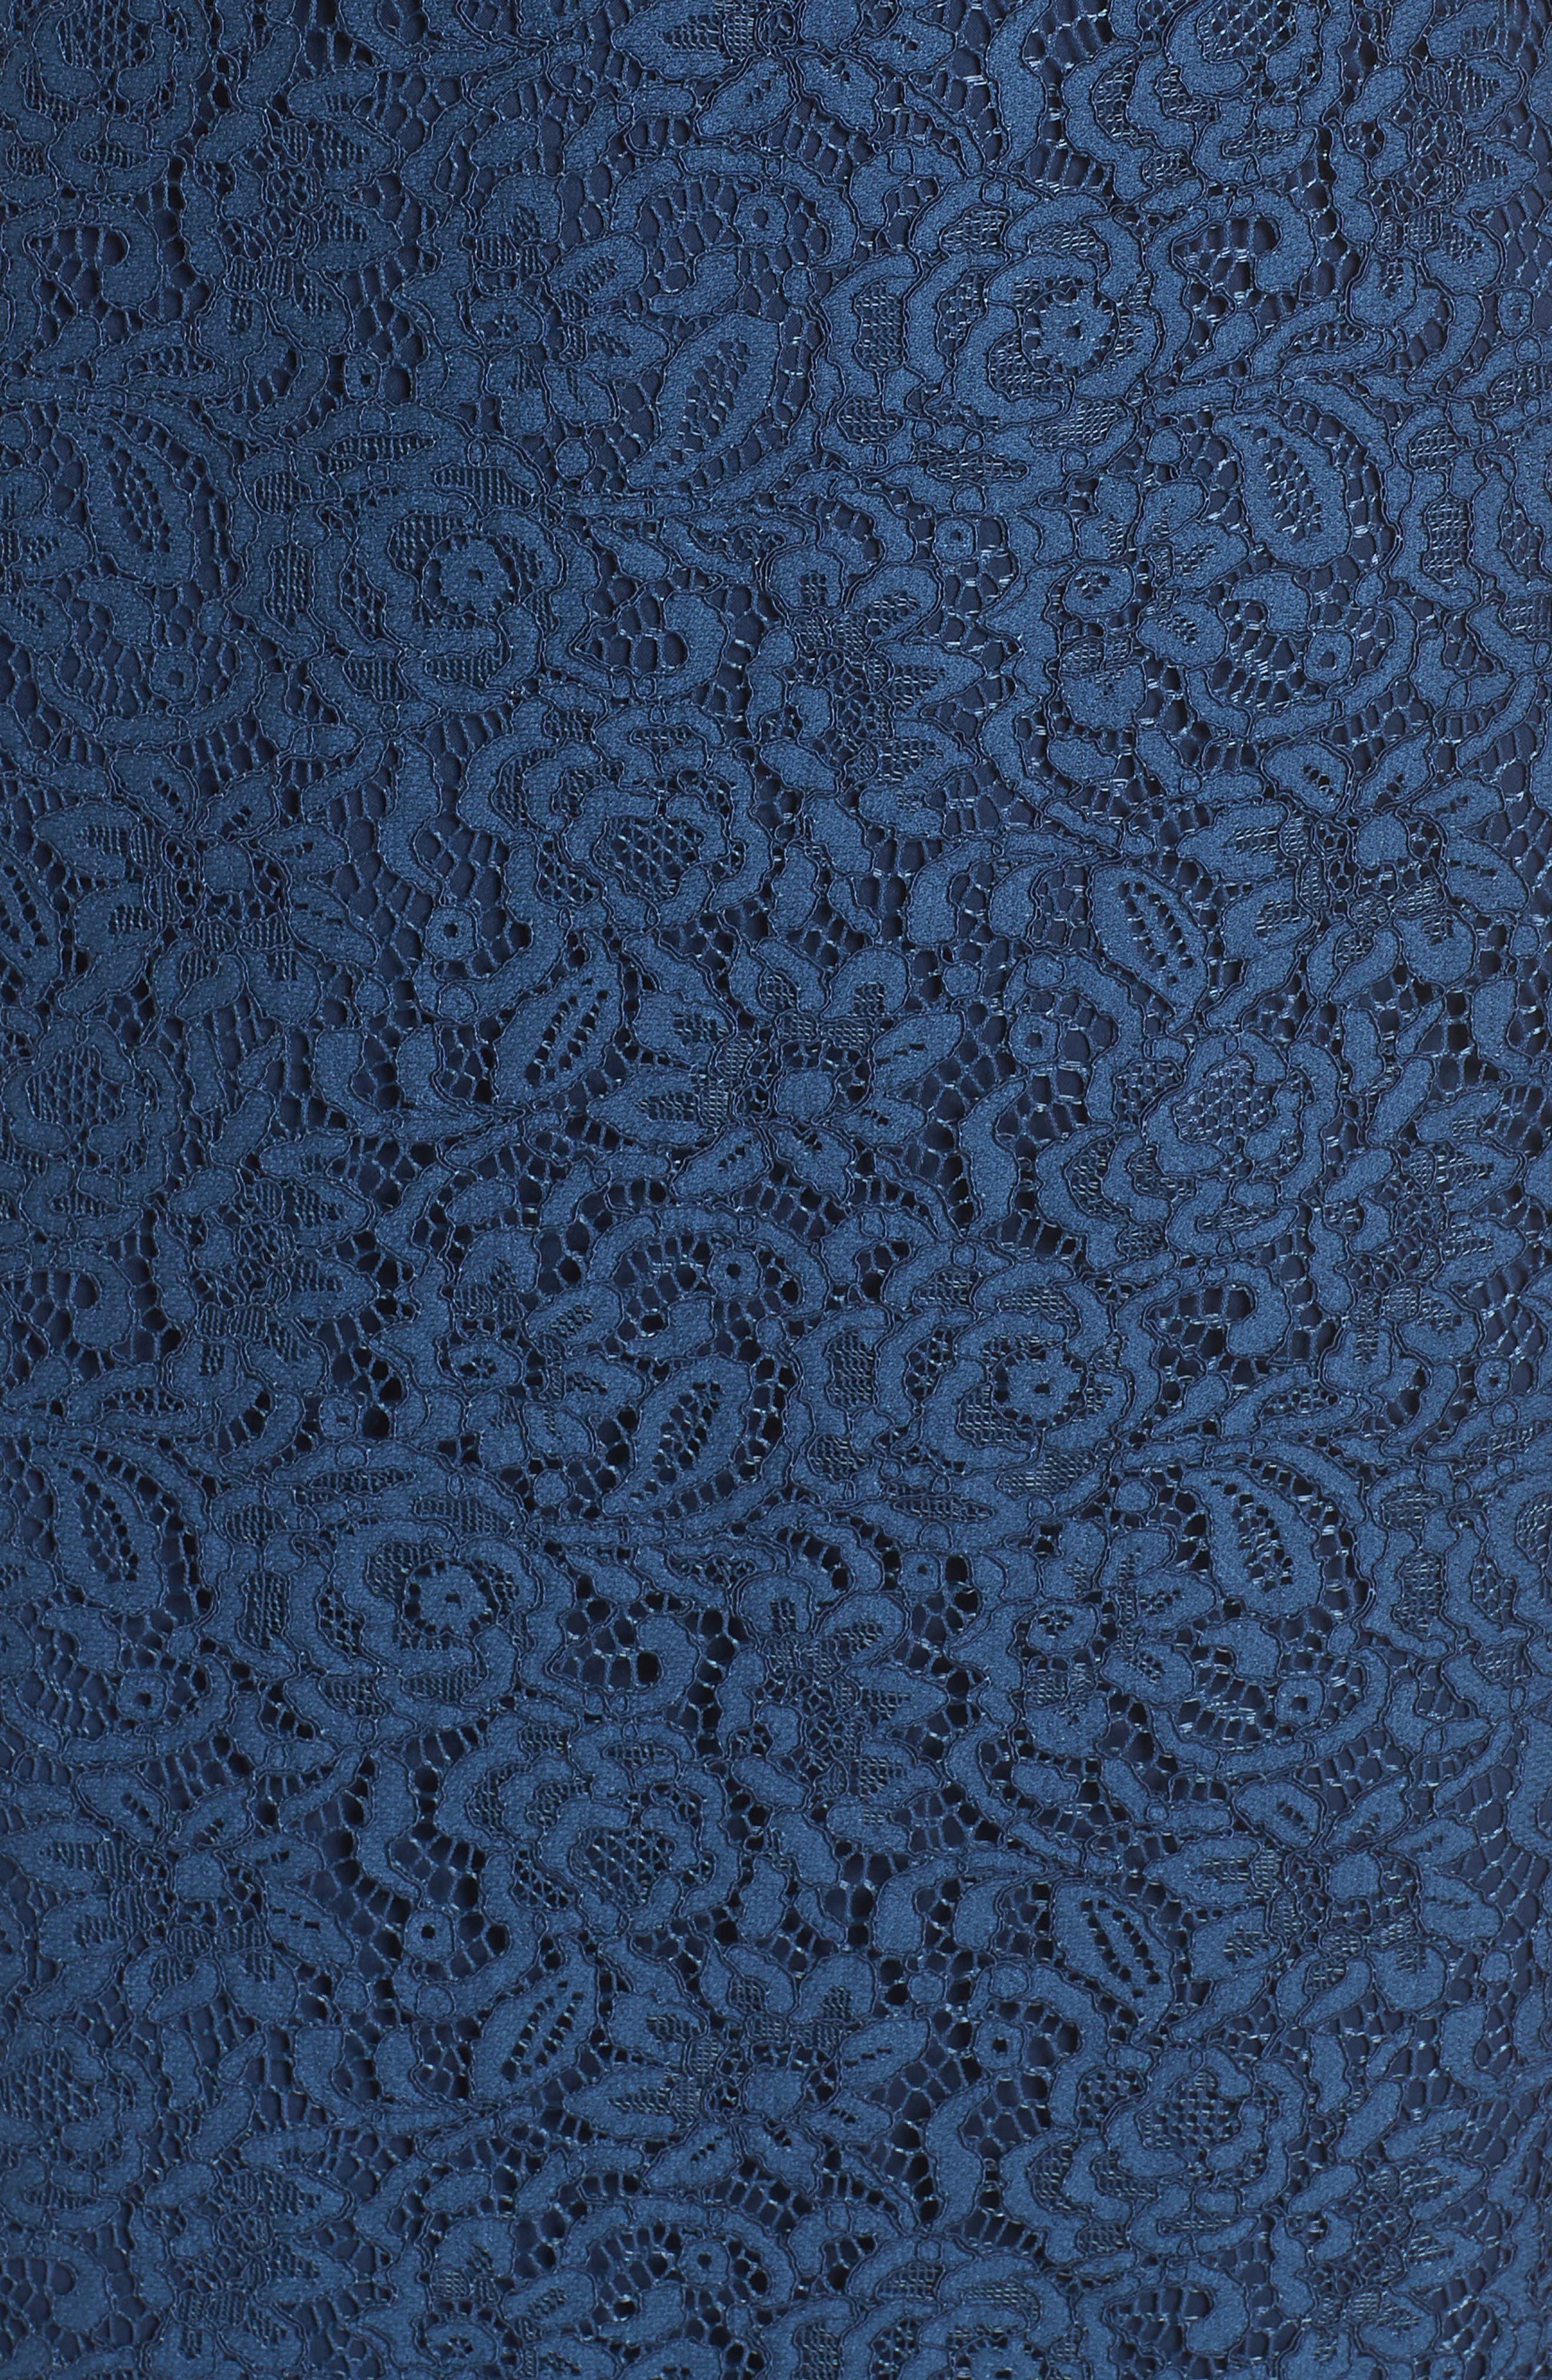 Ginger Rosebud Lace Sheath Dress,                             Alternate thumbnail 6, color,                             462